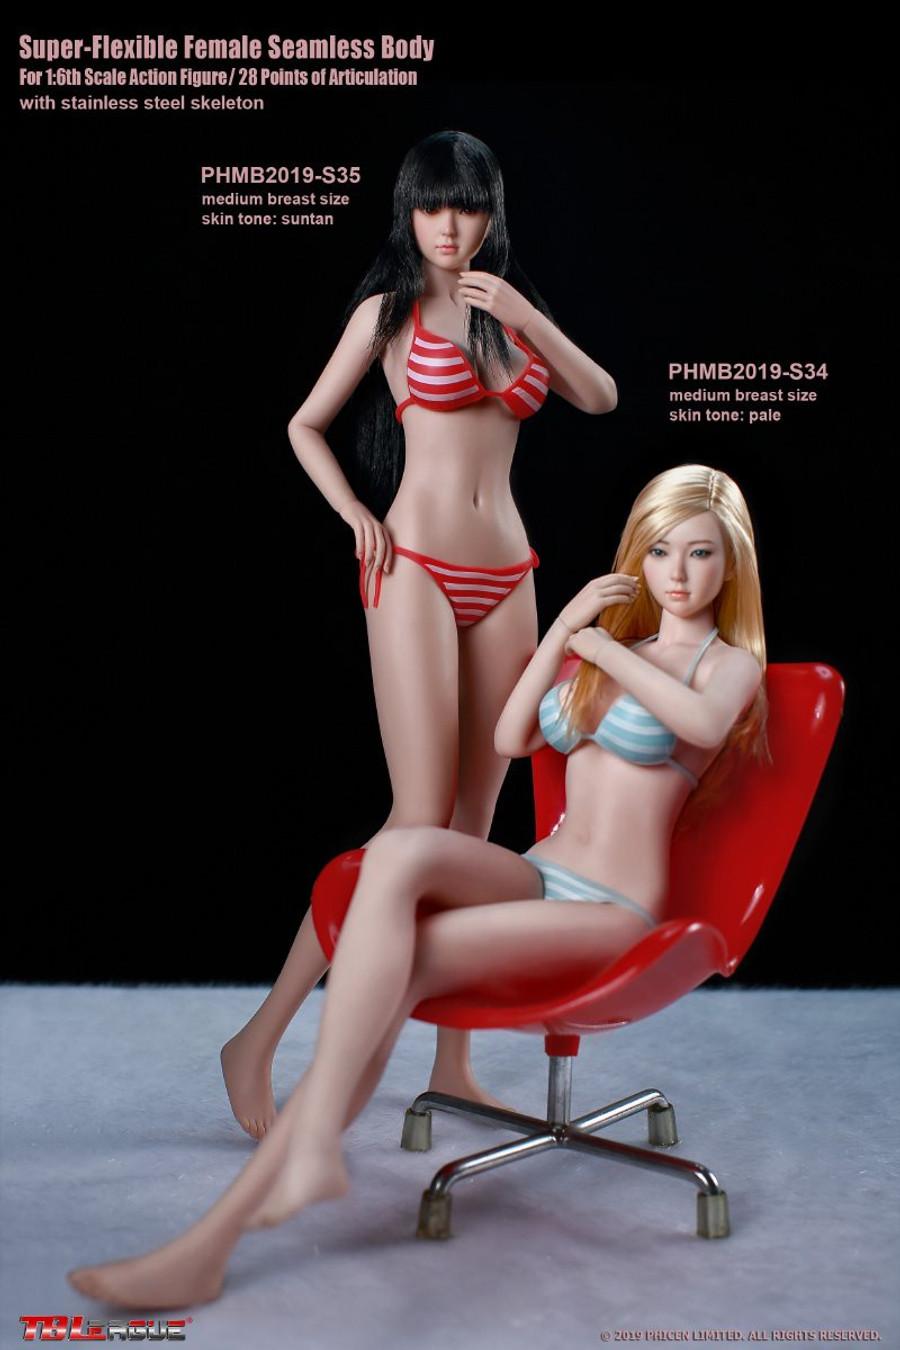 TBLeague - Girl Super-Flexible Seamless Body with Head Sculpt - S34 Pale Medium